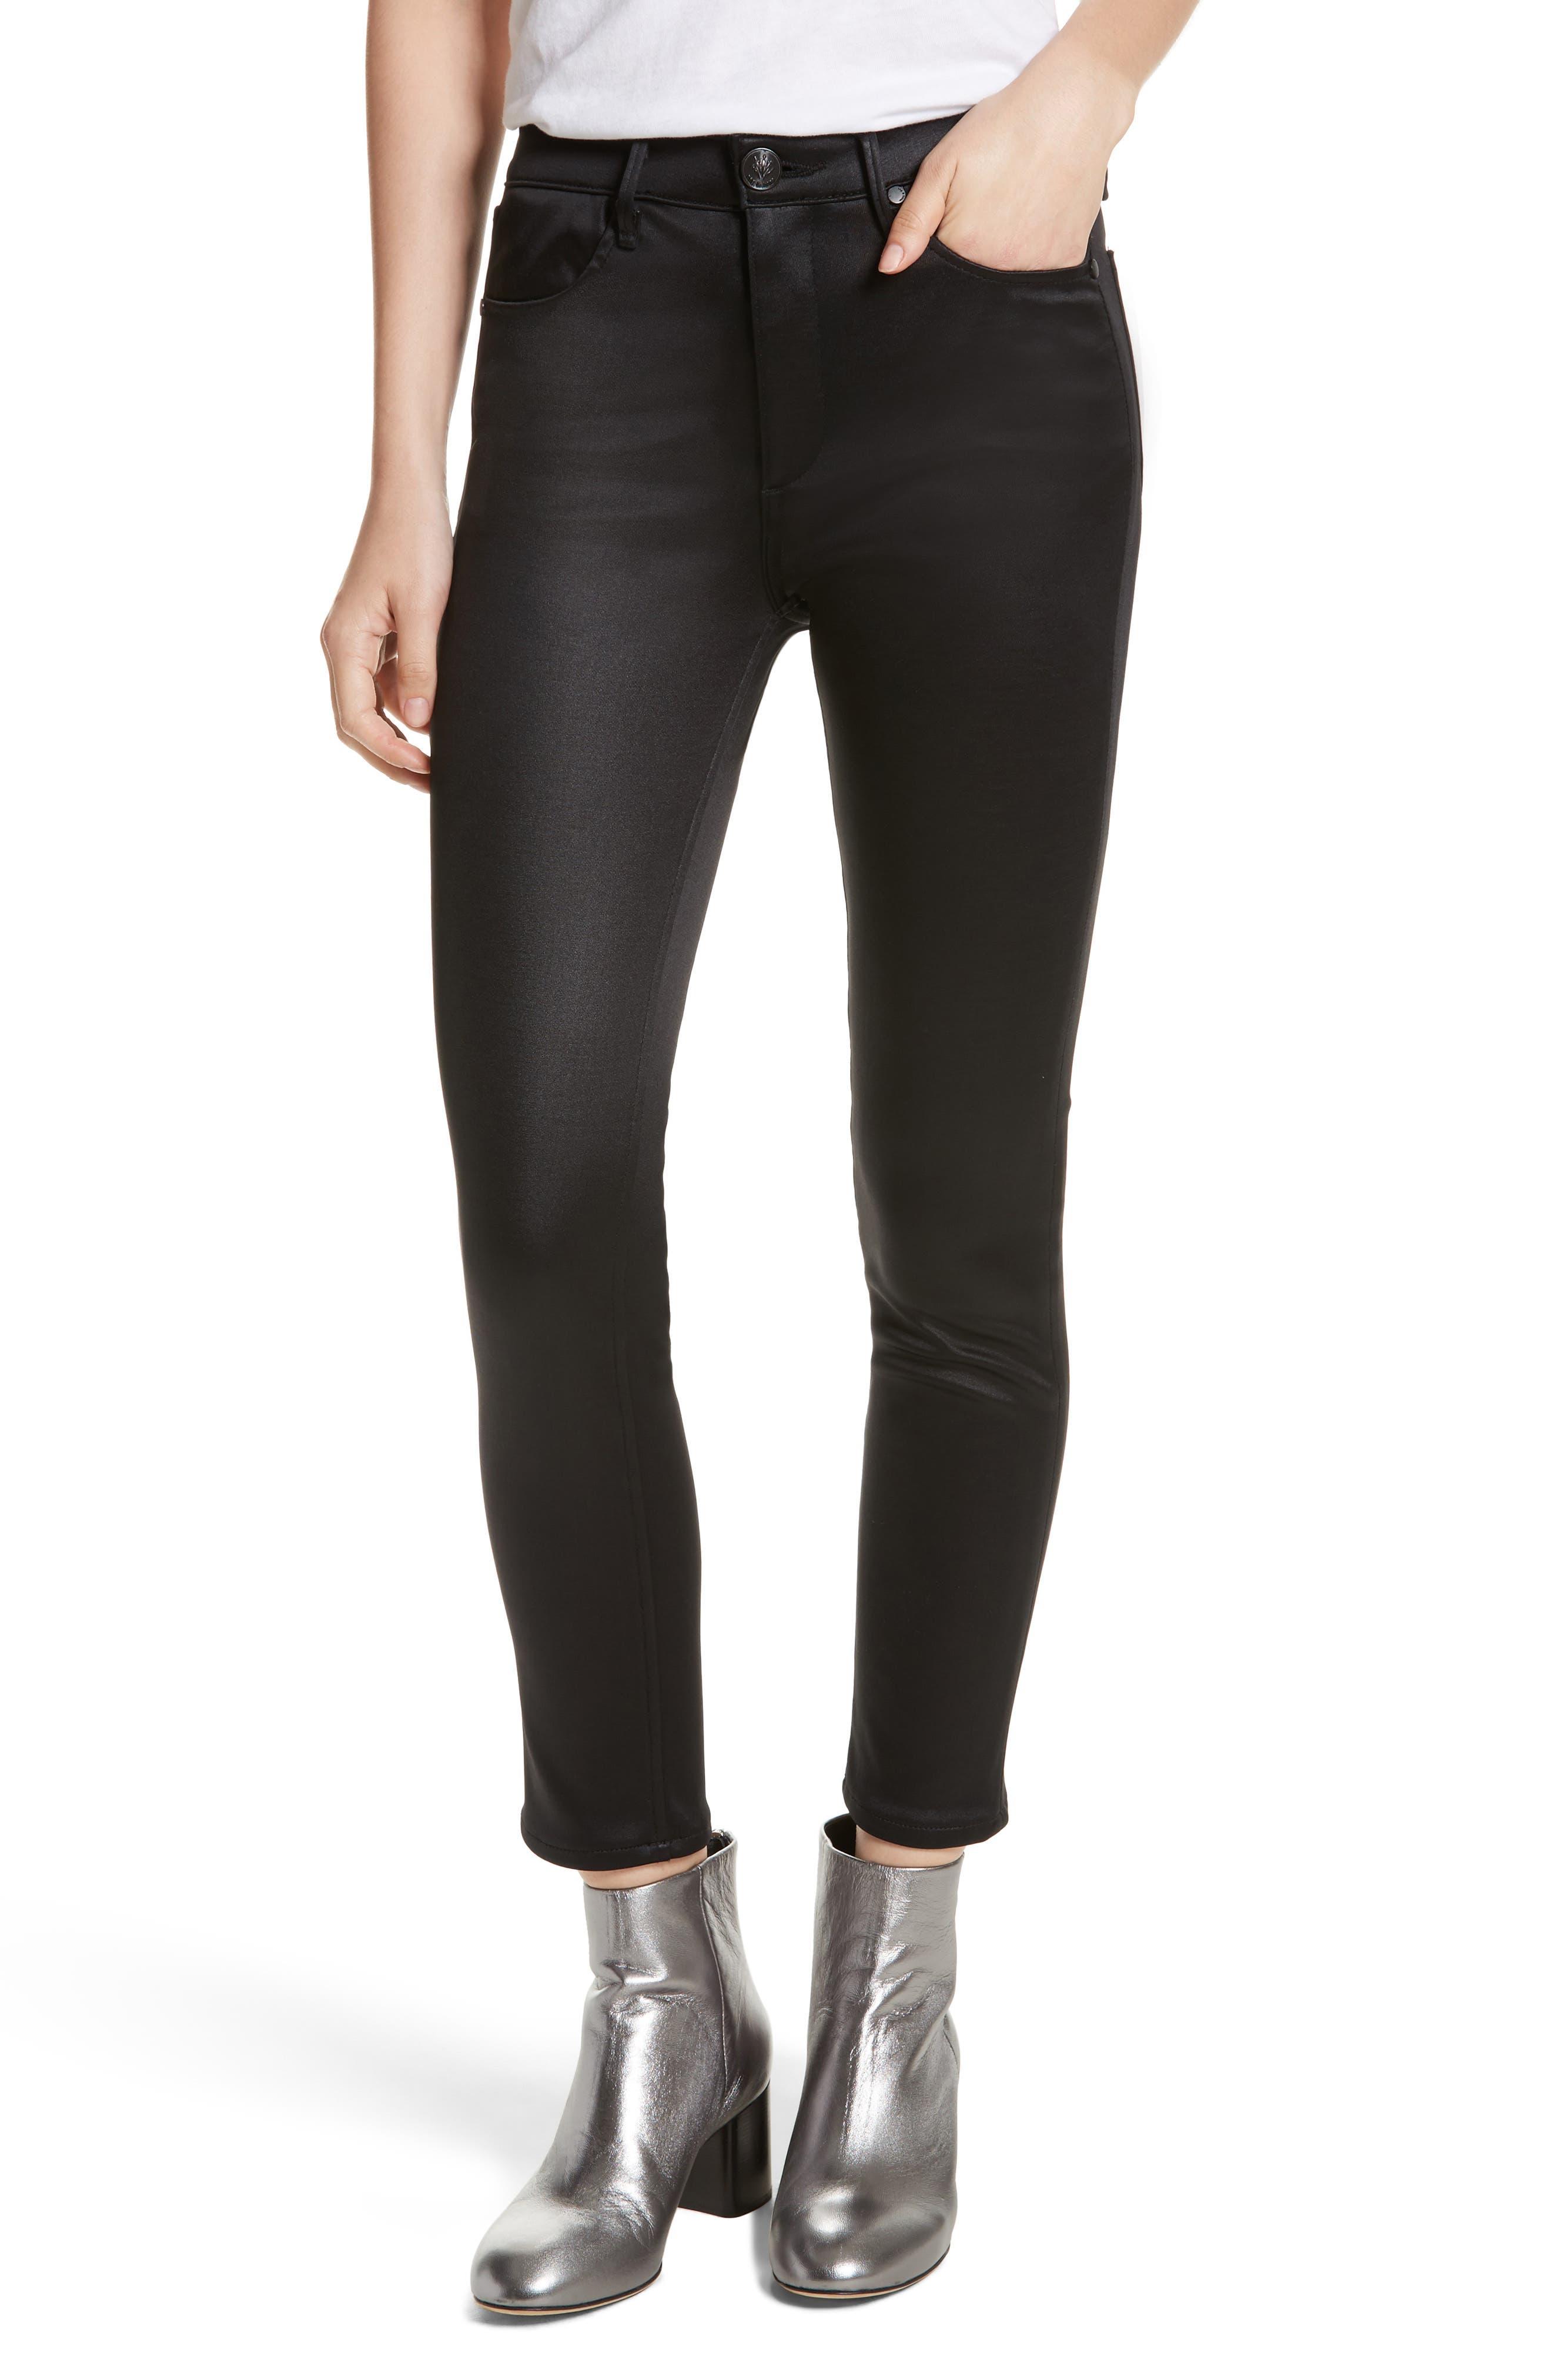 Main Image - rag & bone/JEANS High Waist Ankle Skinny Jeans (Black Sateen)